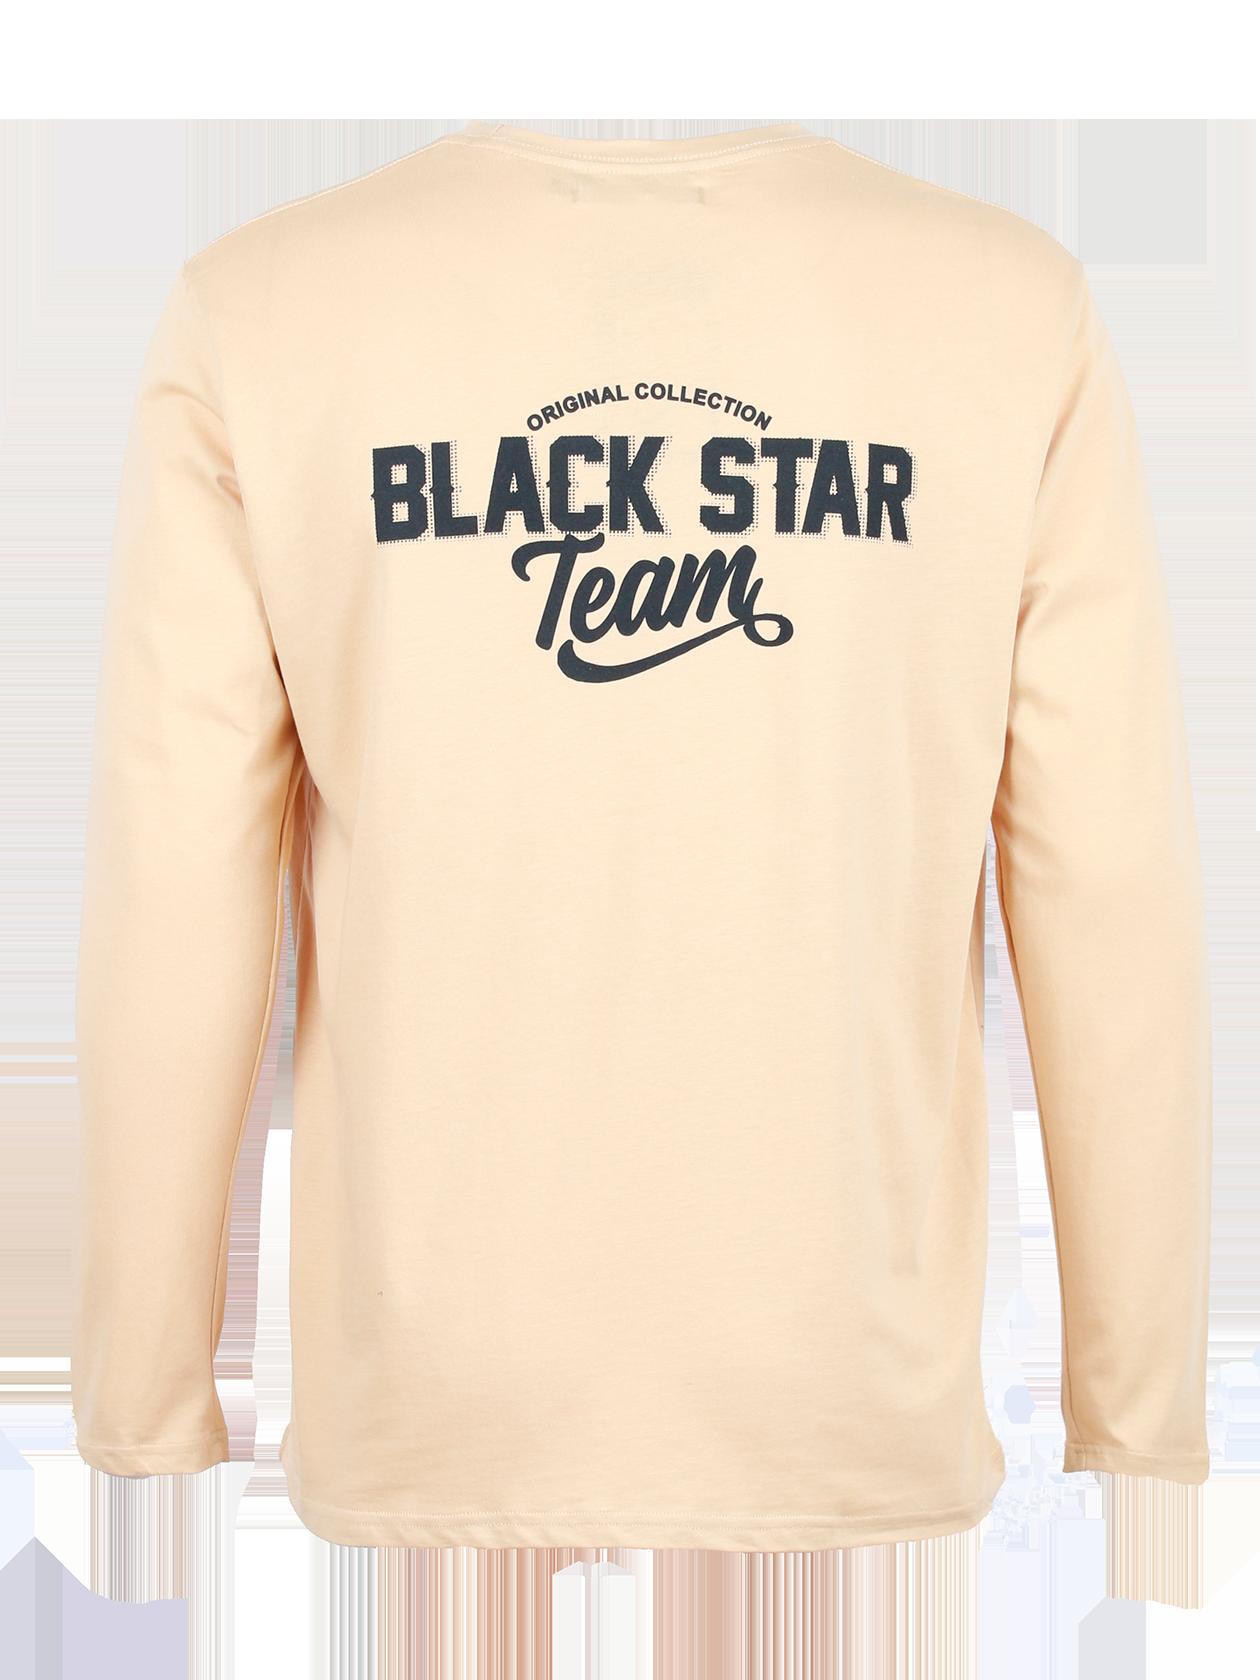 Лонгслив мужской BLACK STAR TEAM от Black Star